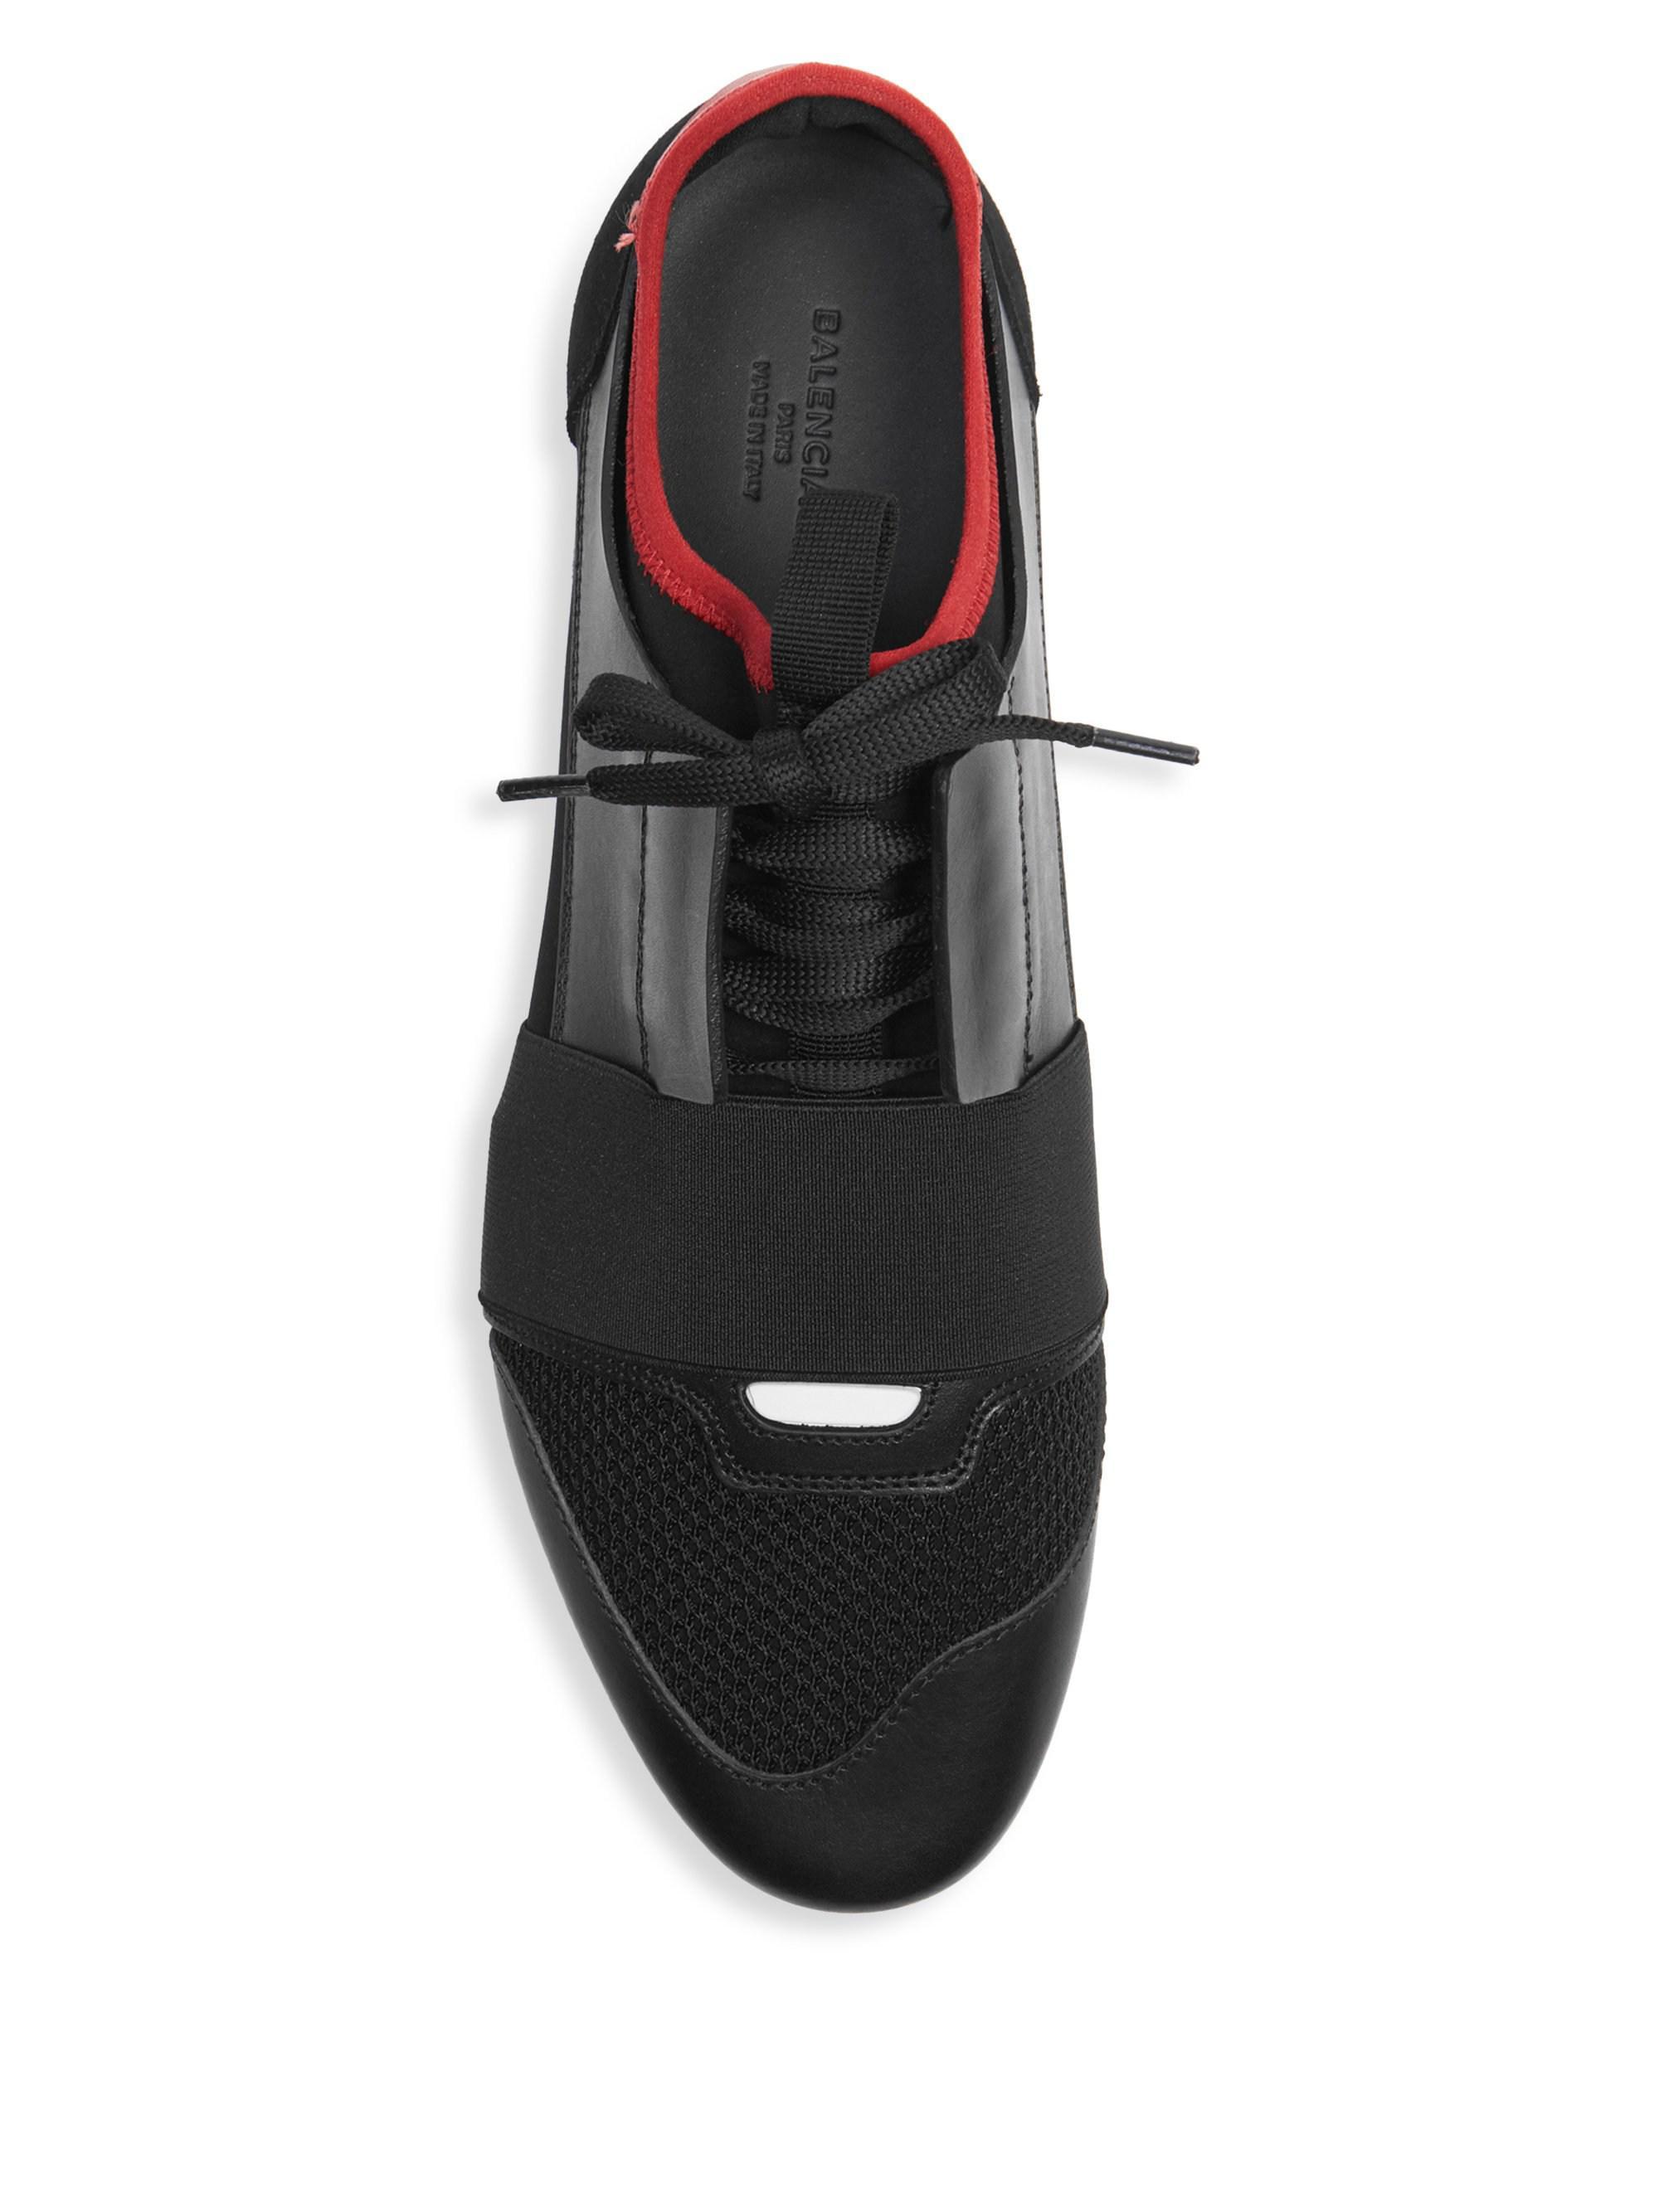 2d3cab3ba4cf Balenciaga - Black Race Runner Sneakers for Men - Lyst. View fullscreen